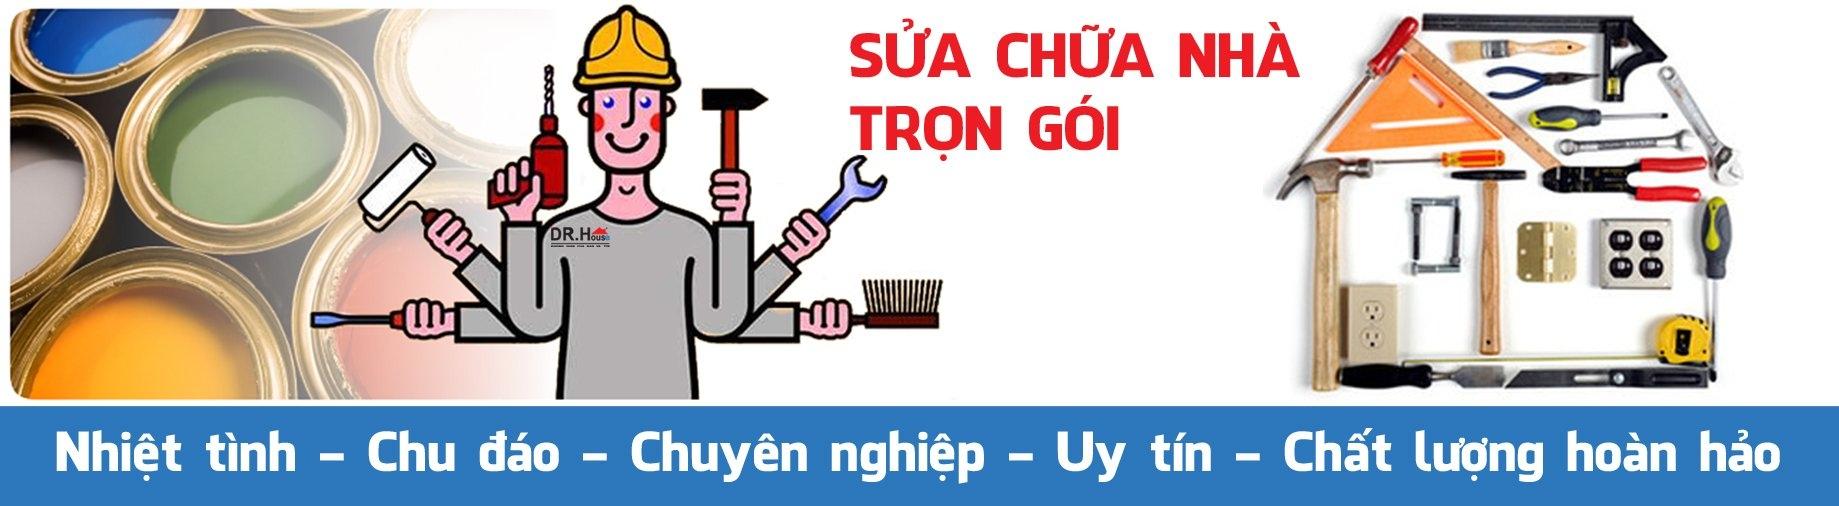 Sua Chua Nha TLG (@tailieugamehp) Cover Image